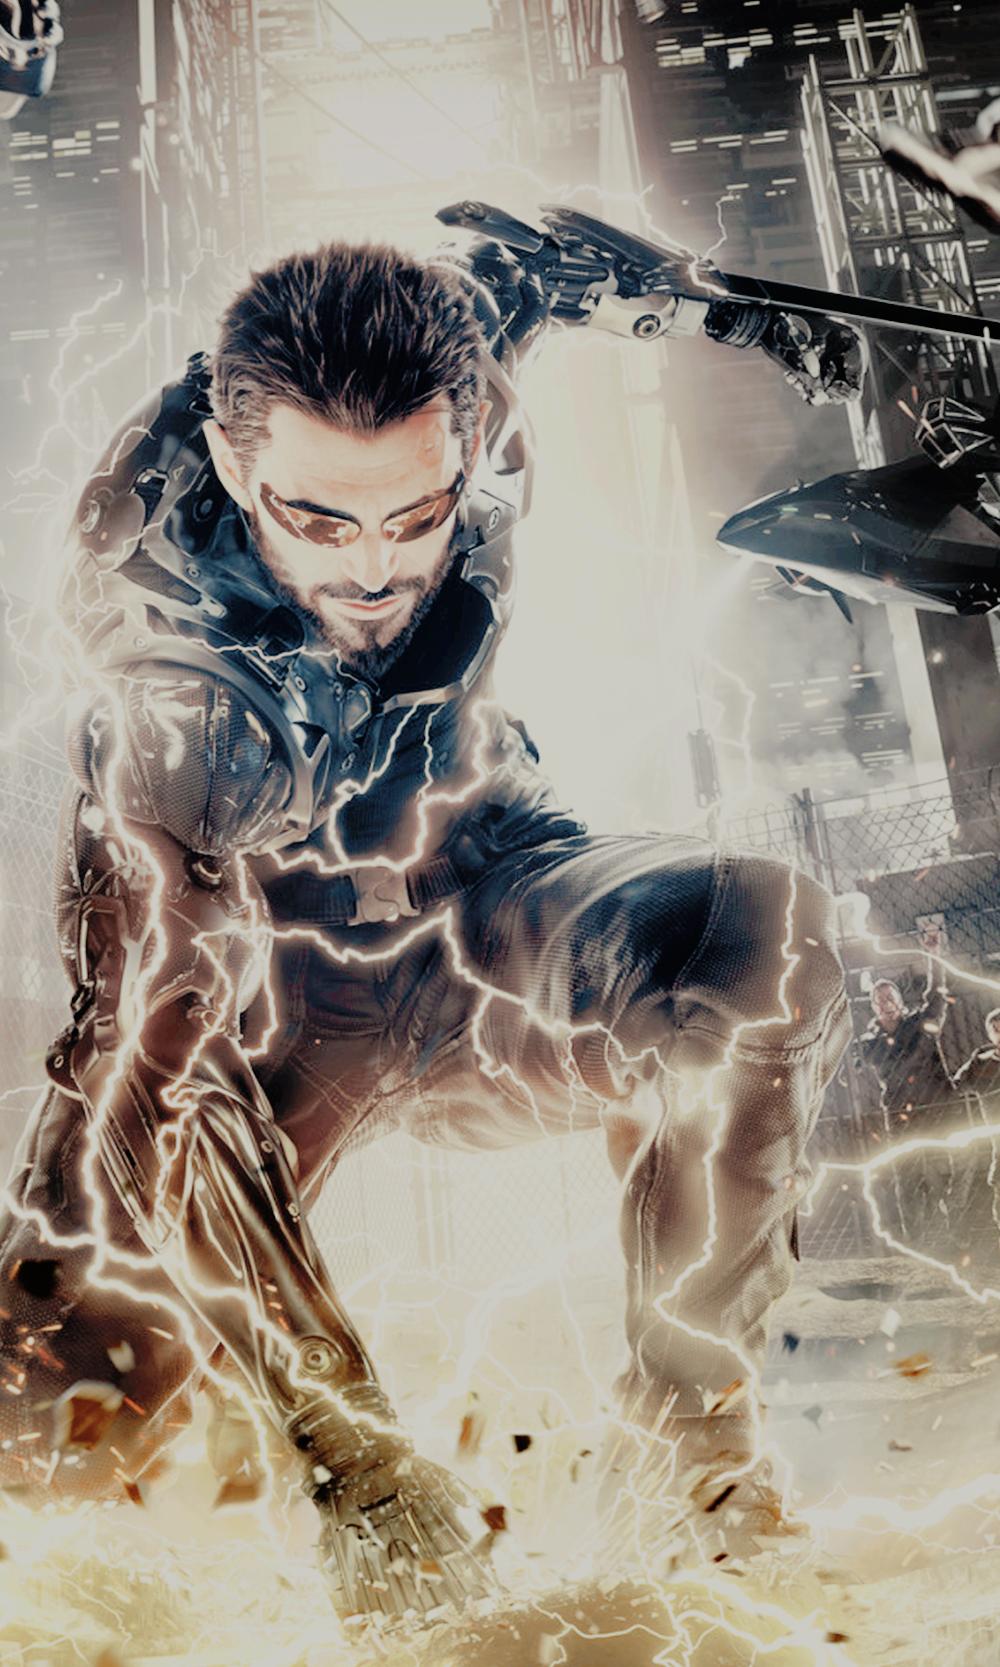 Deus Ex Mankind Divided Adam Jensen Phone Wallpapers Lockscreens ノ ヮ ノ ゚ ゚ Click On The Images For Deus Ex Mankind Divided Deus Ex Mankind Deus Ex